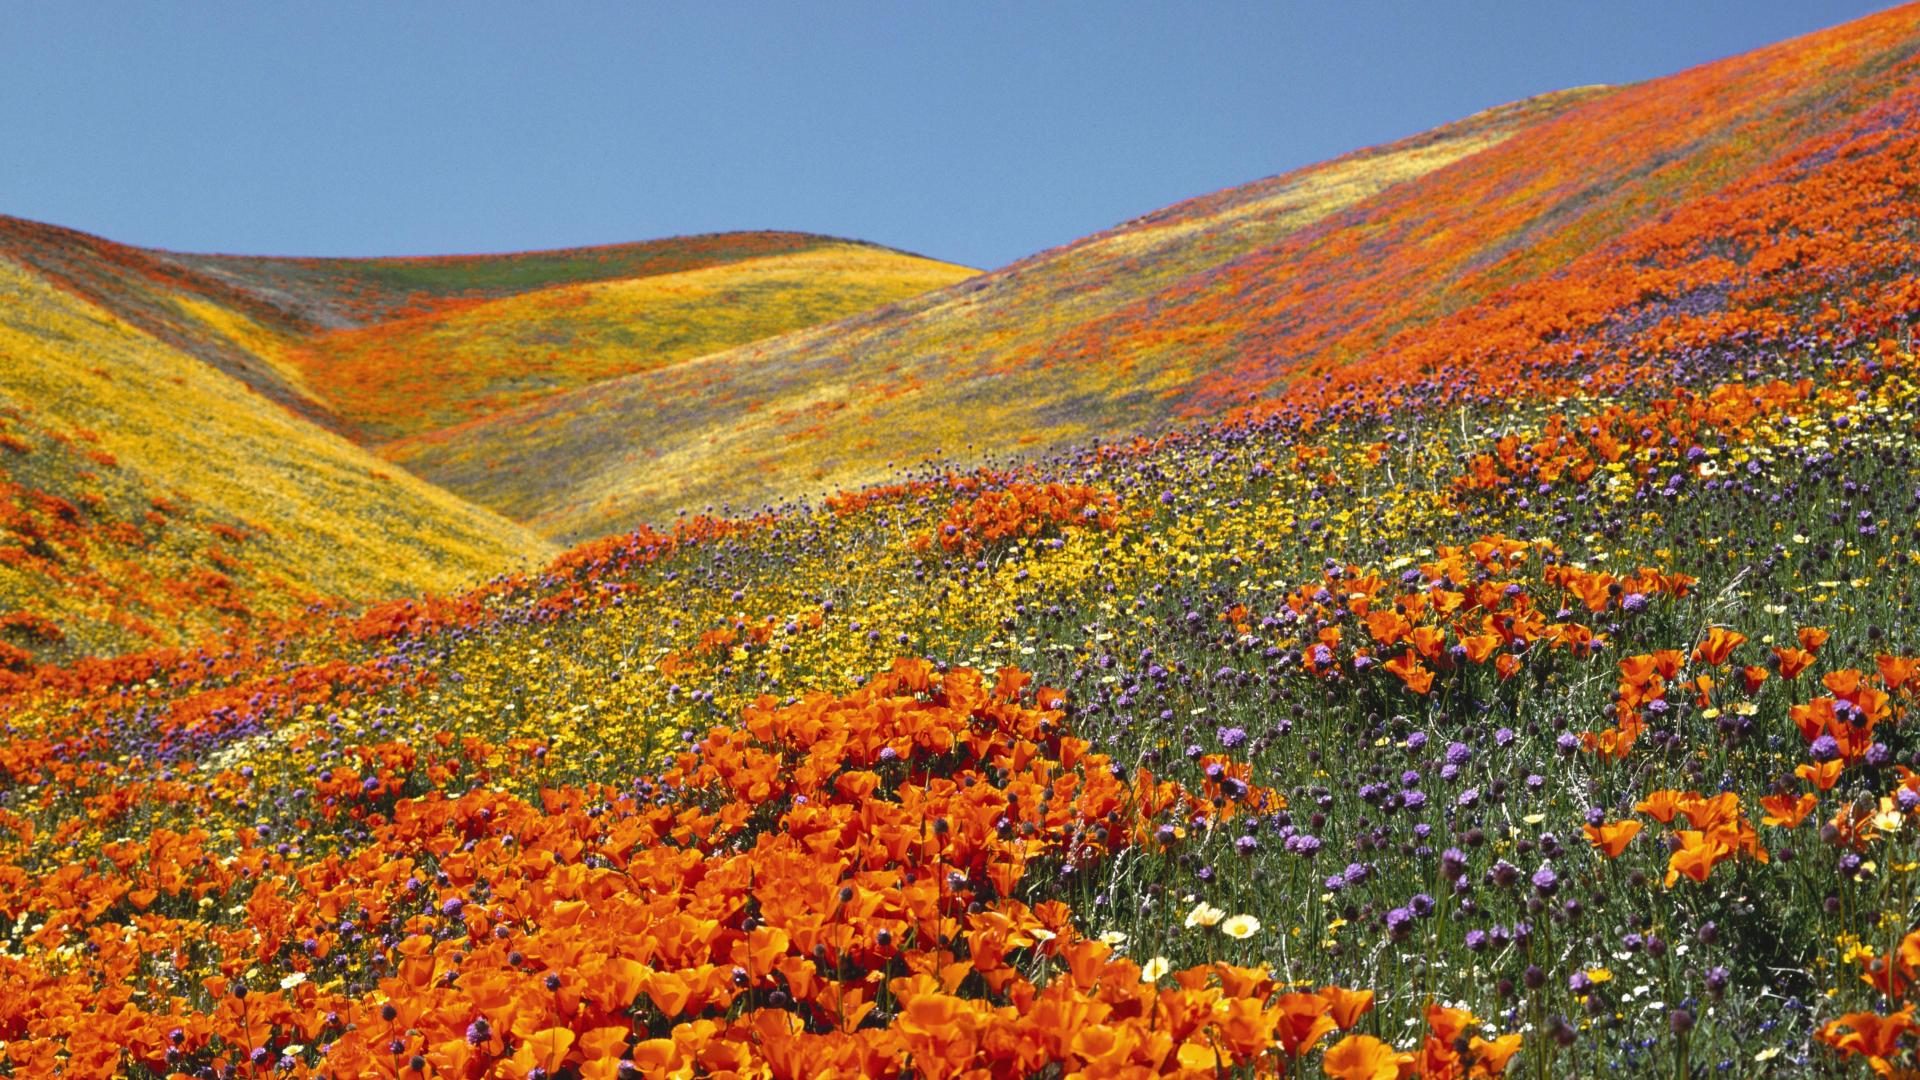 Photo Credit http://uttarakhandpravasi.com/about-uttarakhand/Tourism/valley-of-flowers/